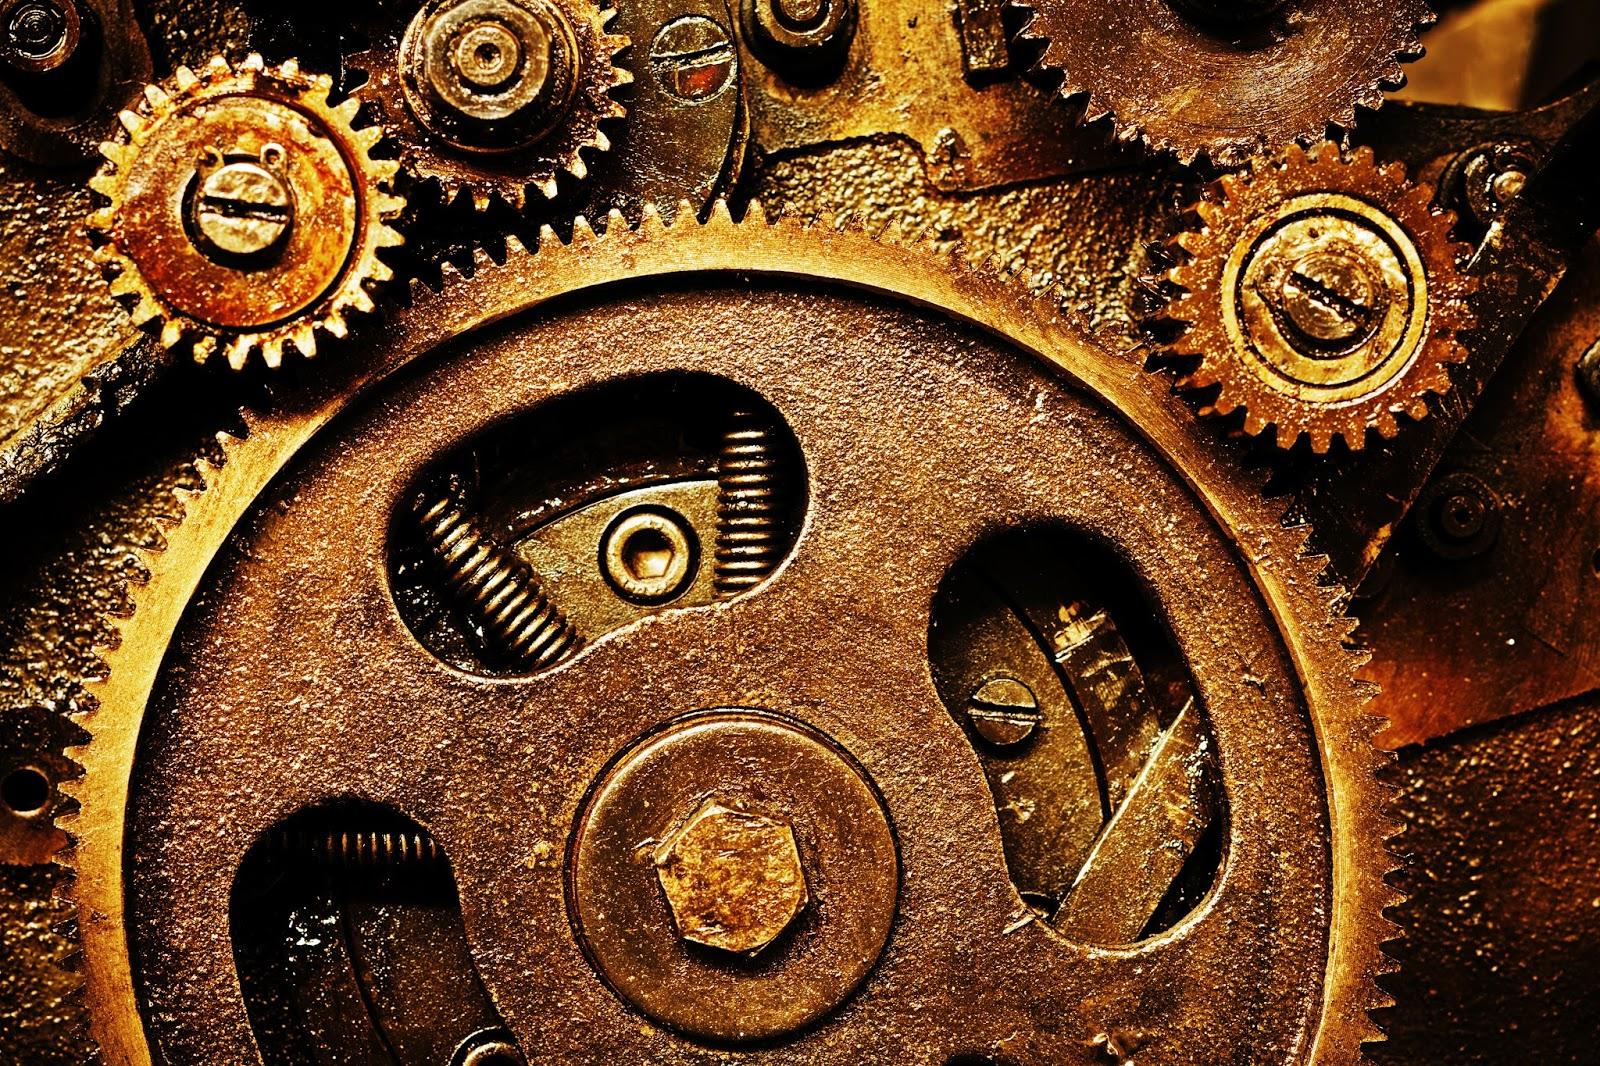 Clockwork Design And Build